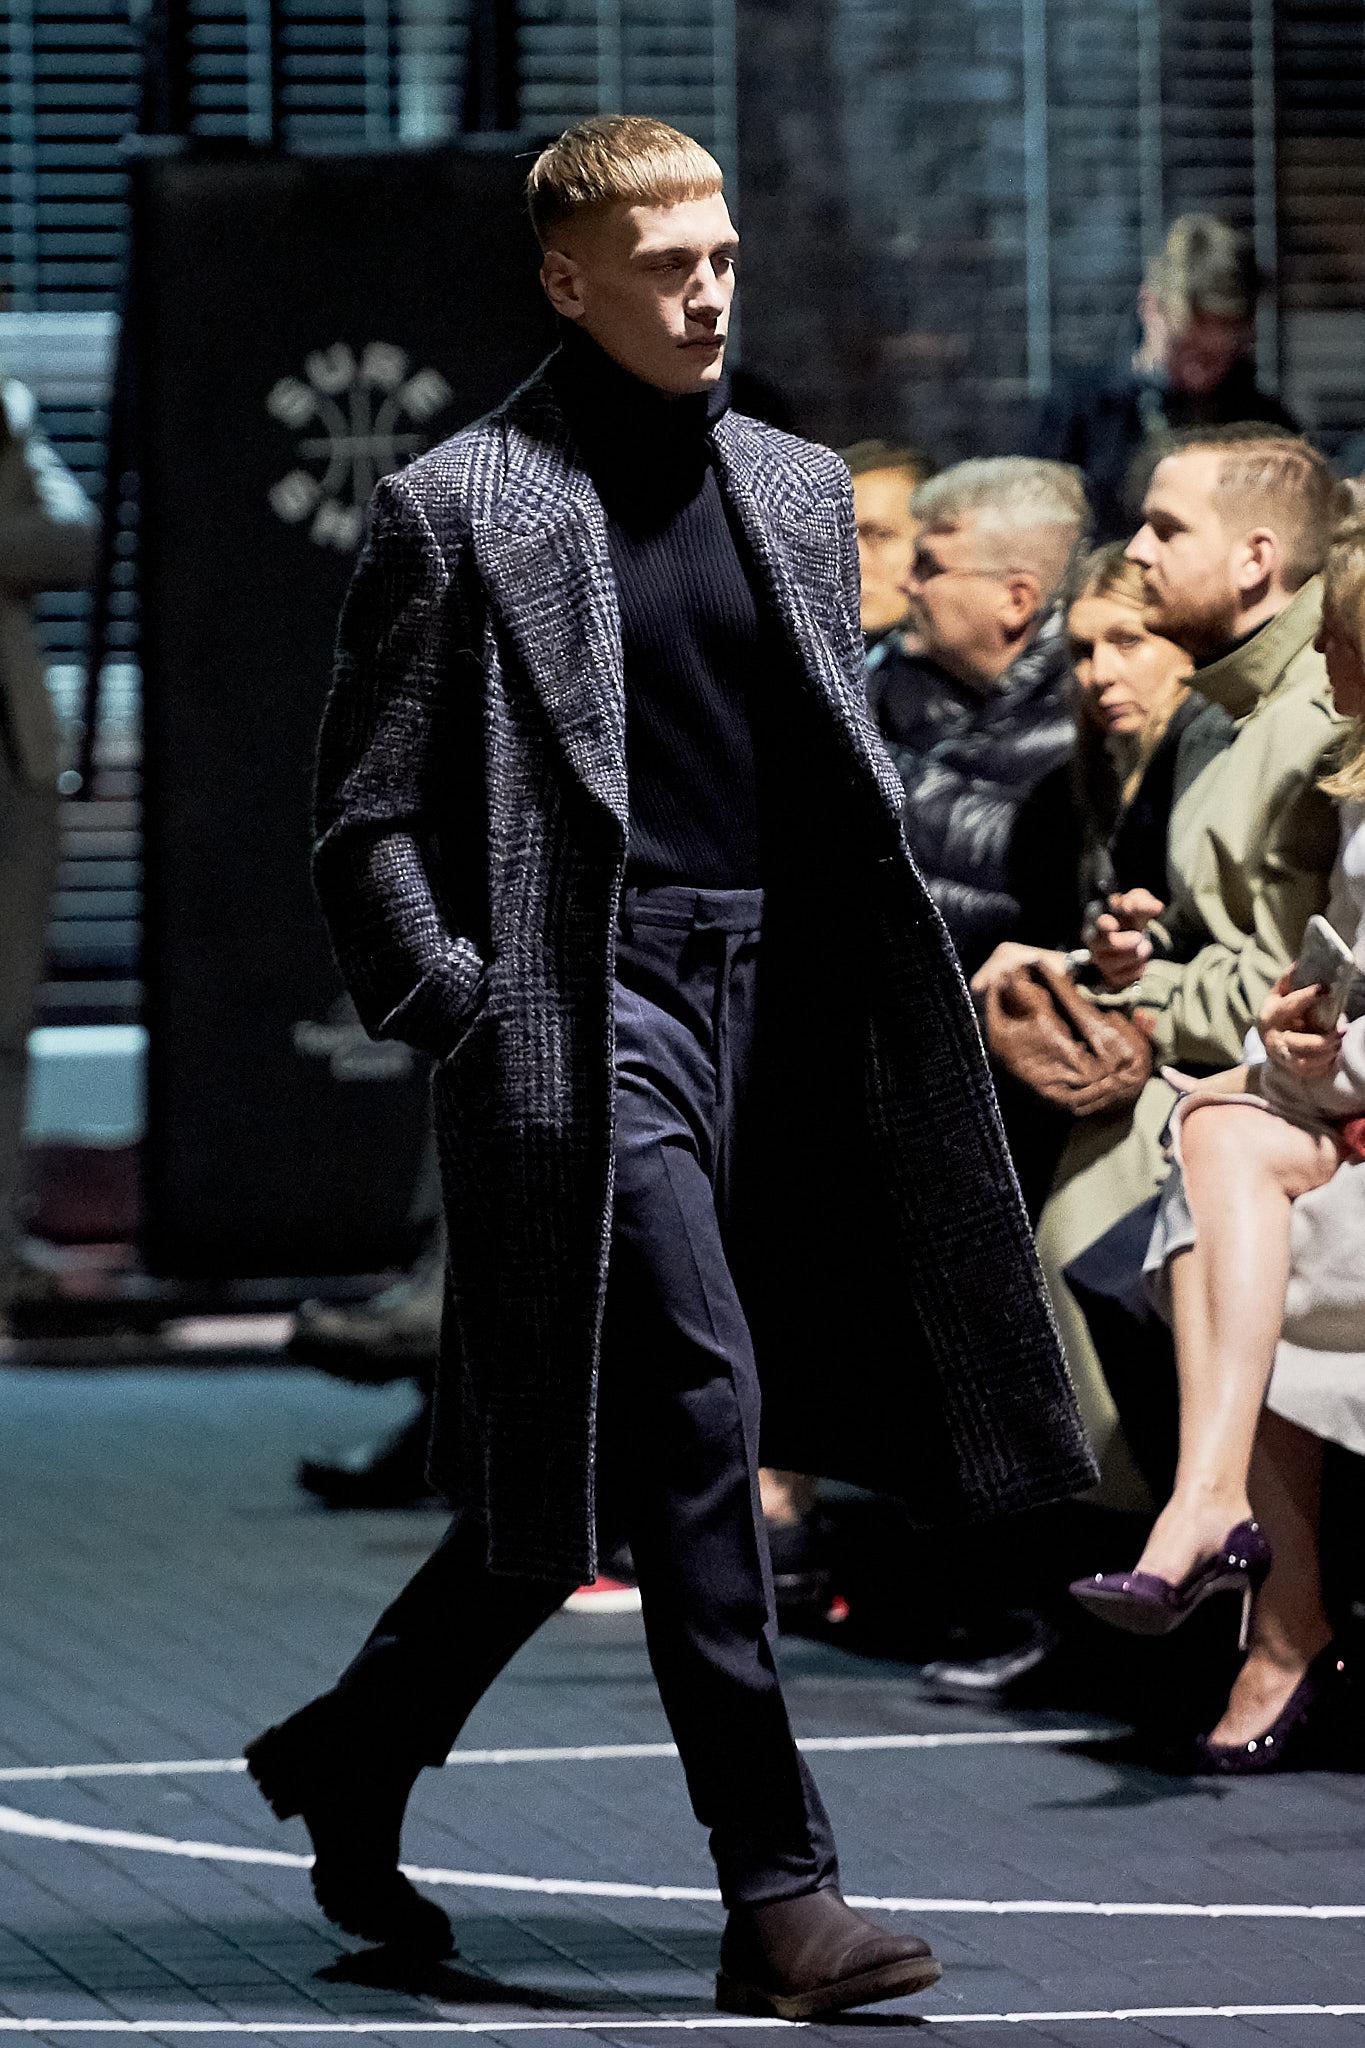 25_KTW_DAY2_121019_OSSOLINSKI_lowres-fotFilipOkopny-FashionImages